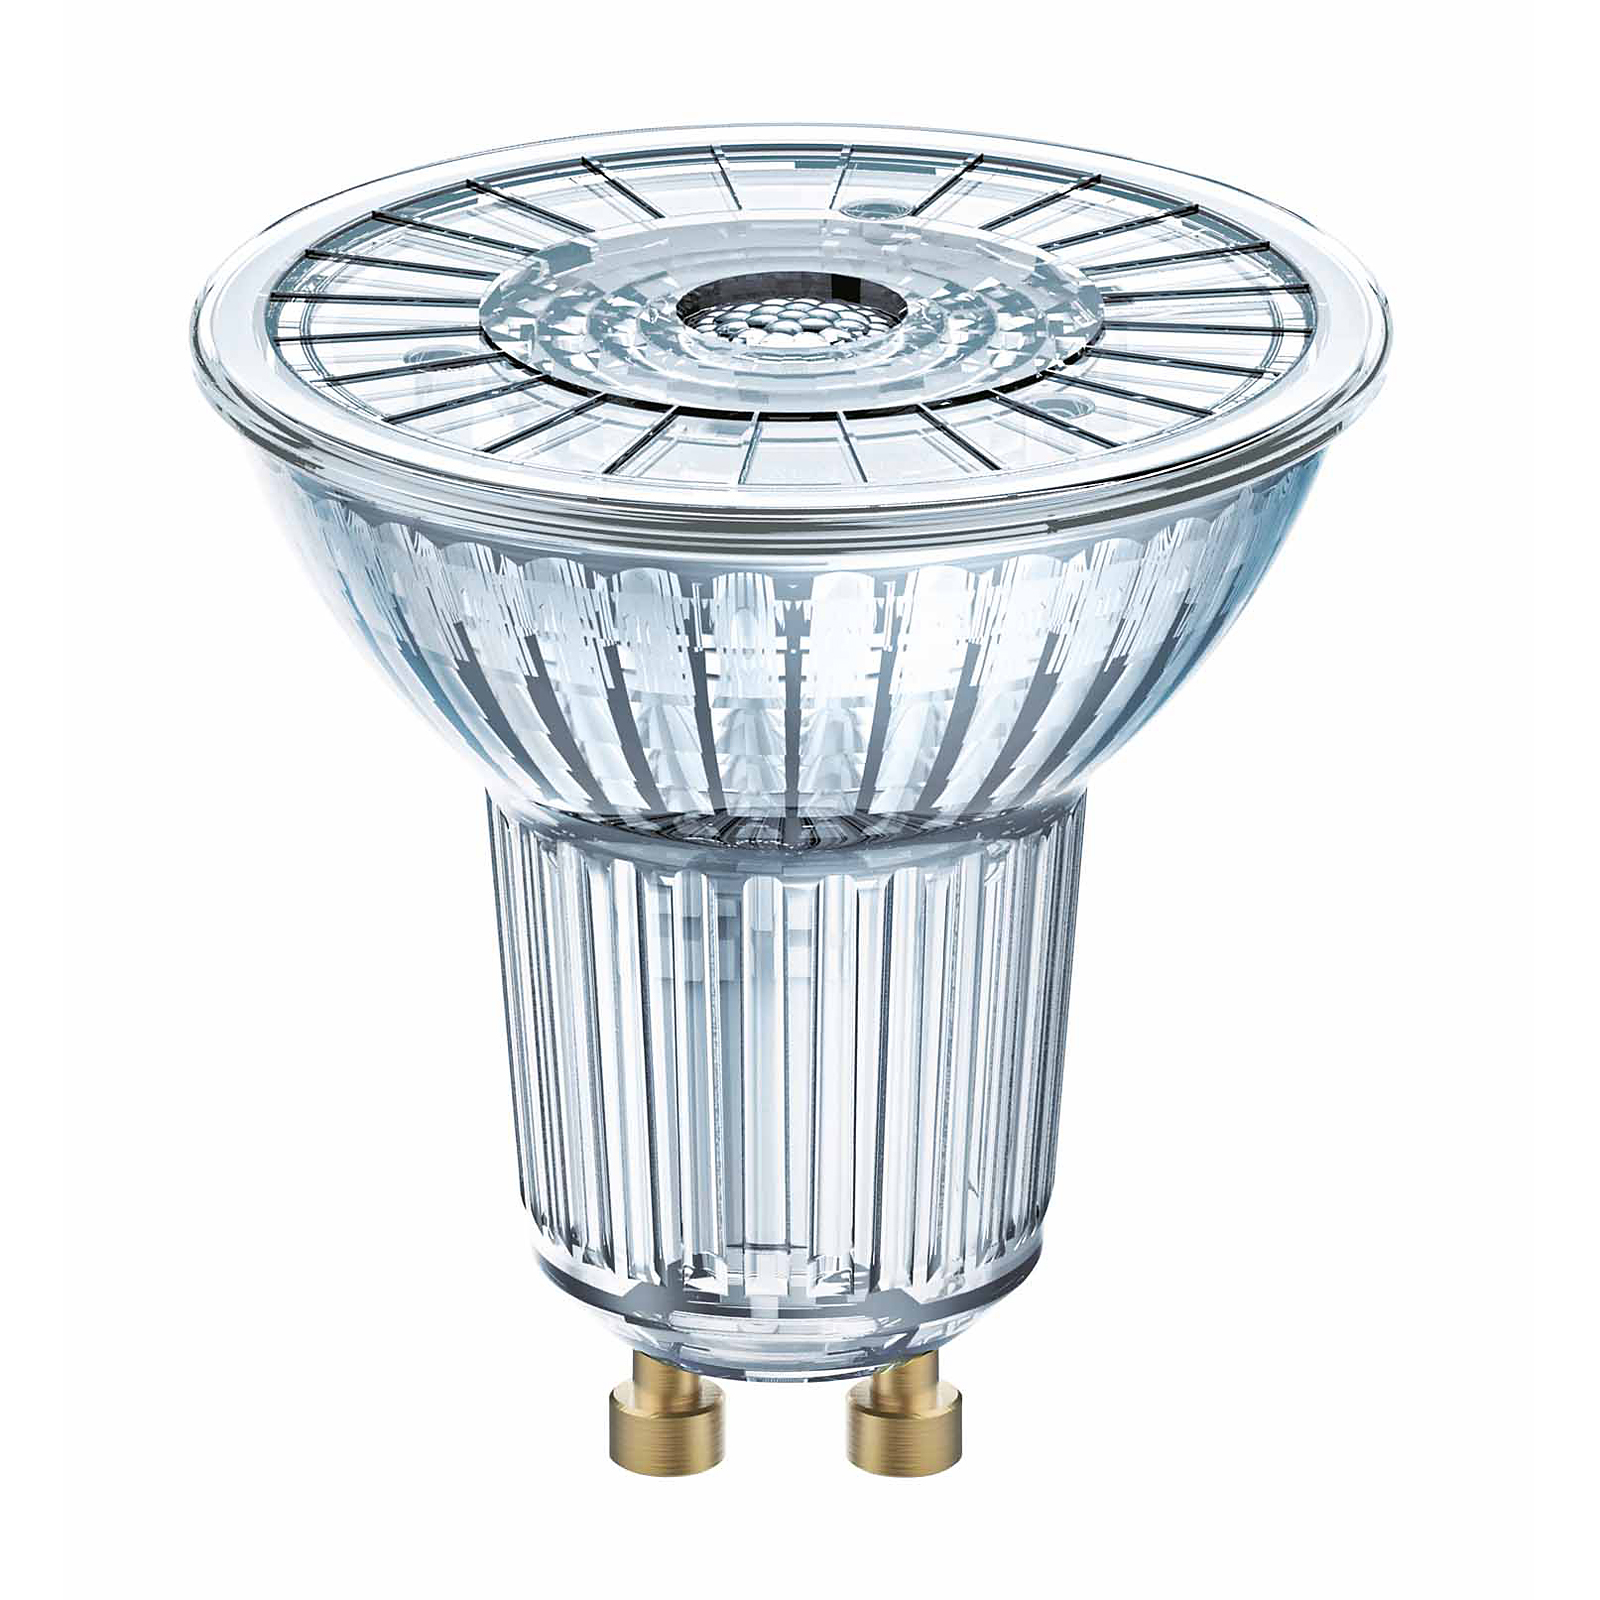 11027-OSRAM-LED-Glas-Spot-GU10-3W-ersetzt-35-Watt-230-lm-36-kaltweiss-dimmbar-1 Verwunderlich Led Gu10 Dimmbar 120 Dekorationen